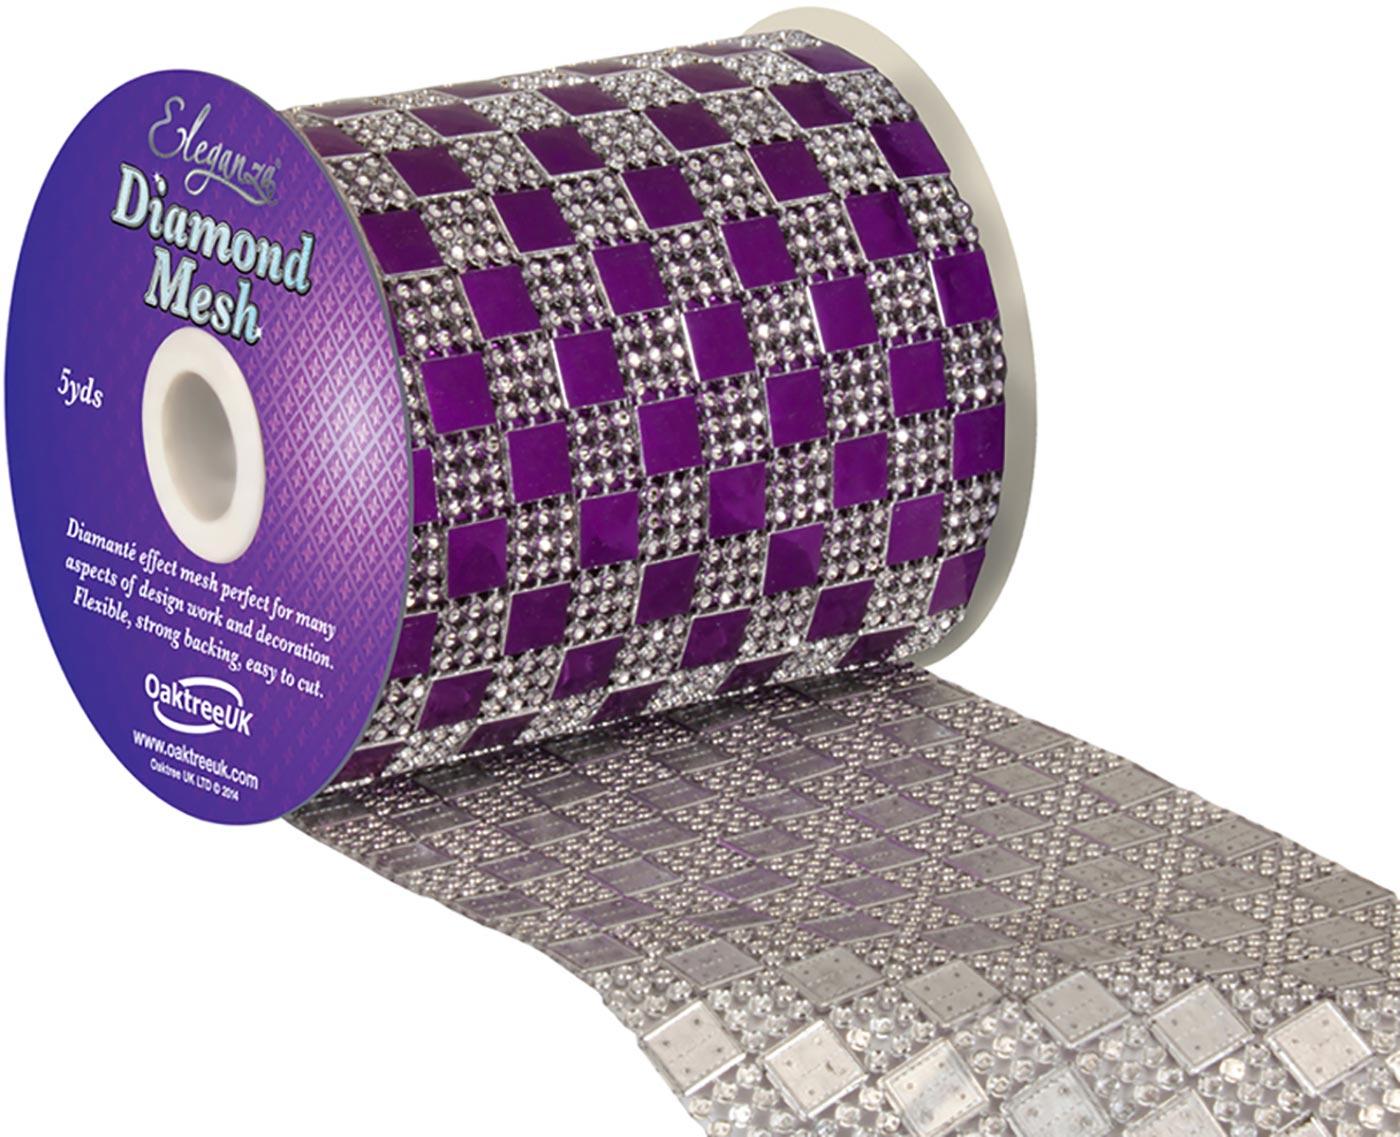 Eleganza Diamond Mesh 11cm x 4.5m Pattern No.350 Purple